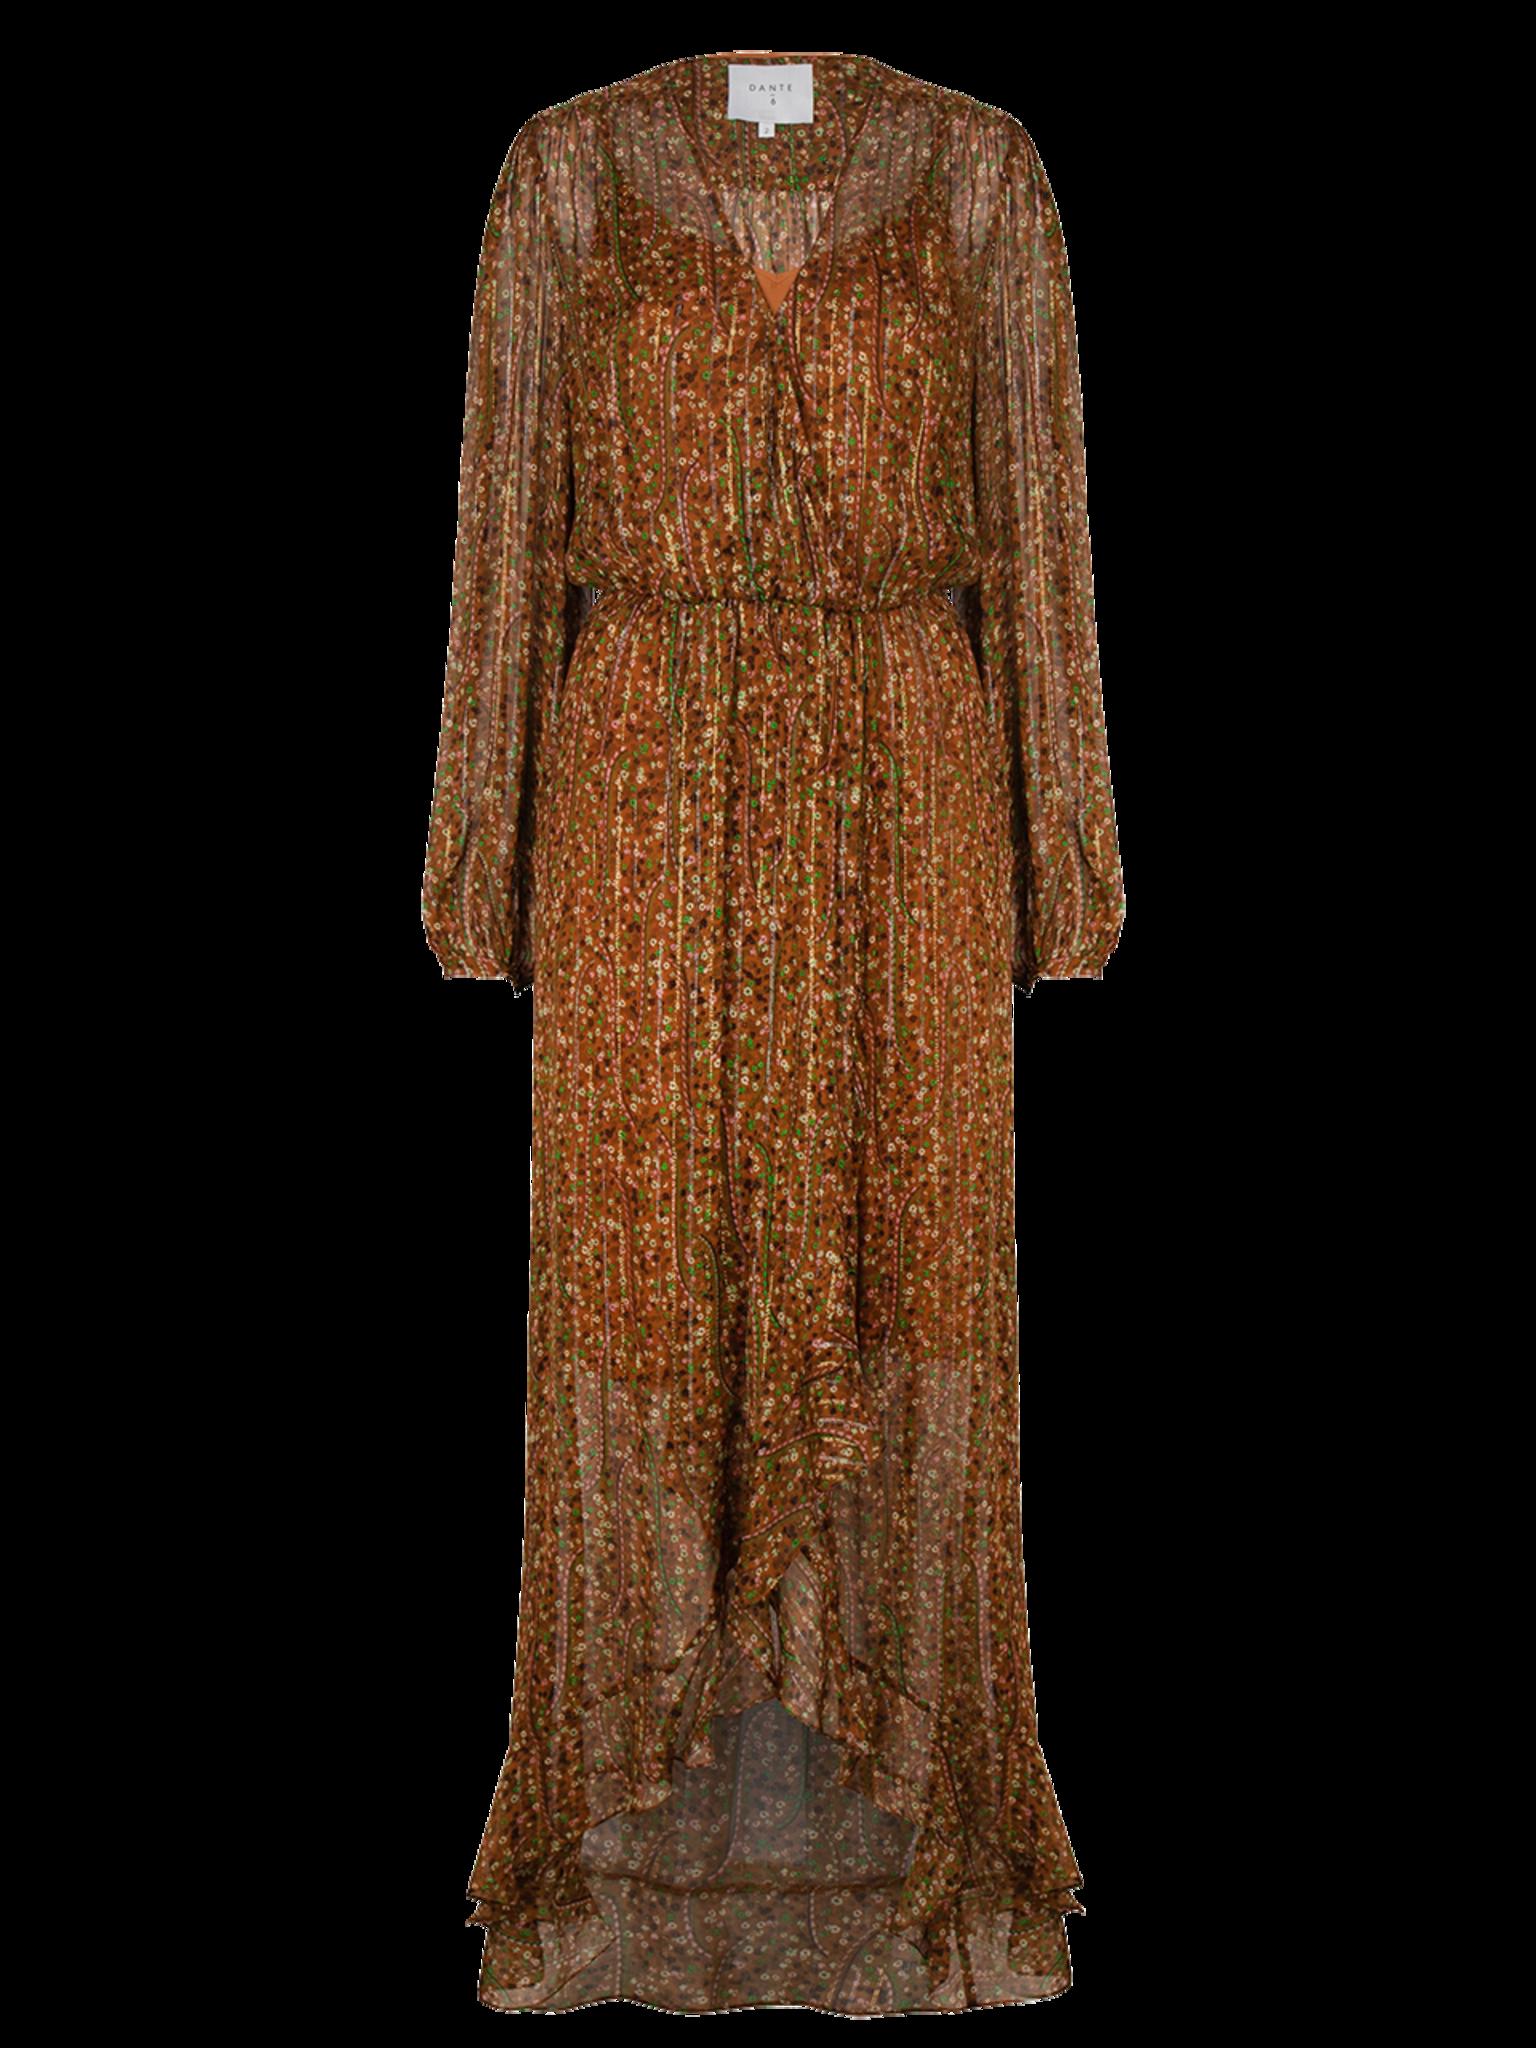 Dante 6 dress 211120 FLIRTY-1